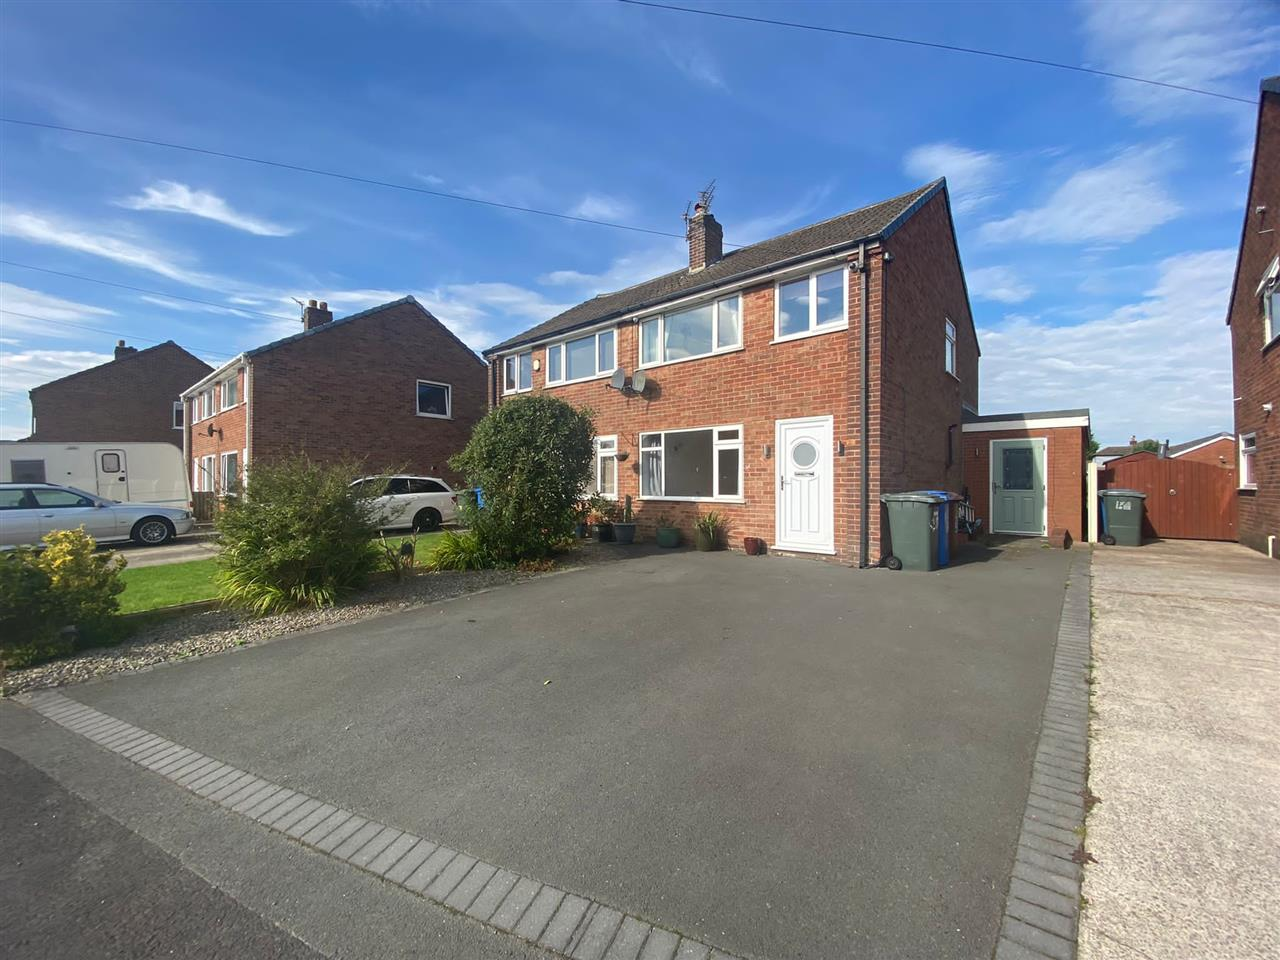 3 bed semi-detached to rent in Lewis Close, Adlington, PR7